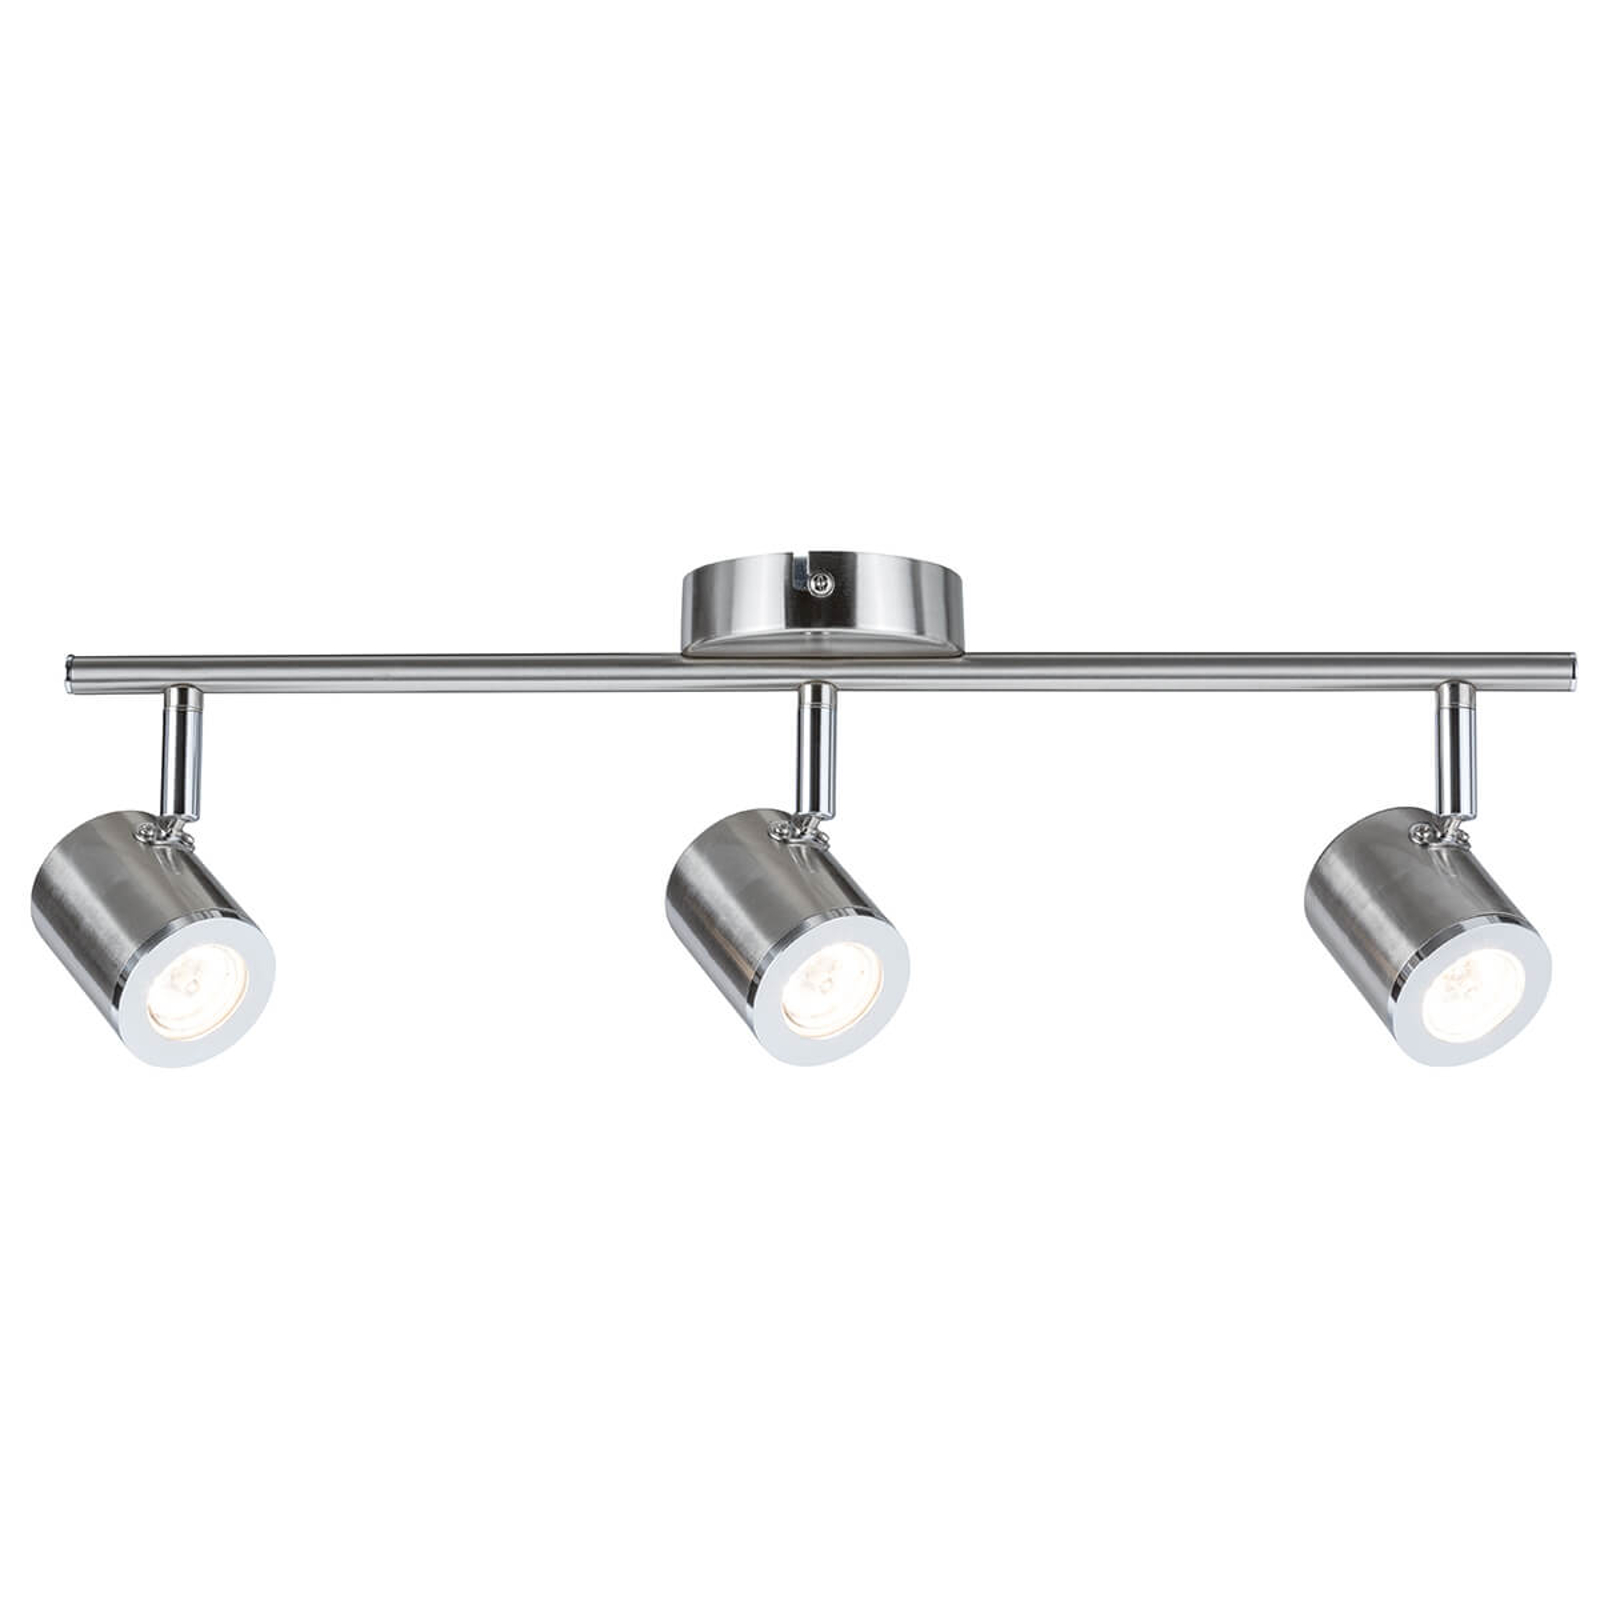 Paulmann Tumbler LED-Deckenlampe mit 3 Strahlern